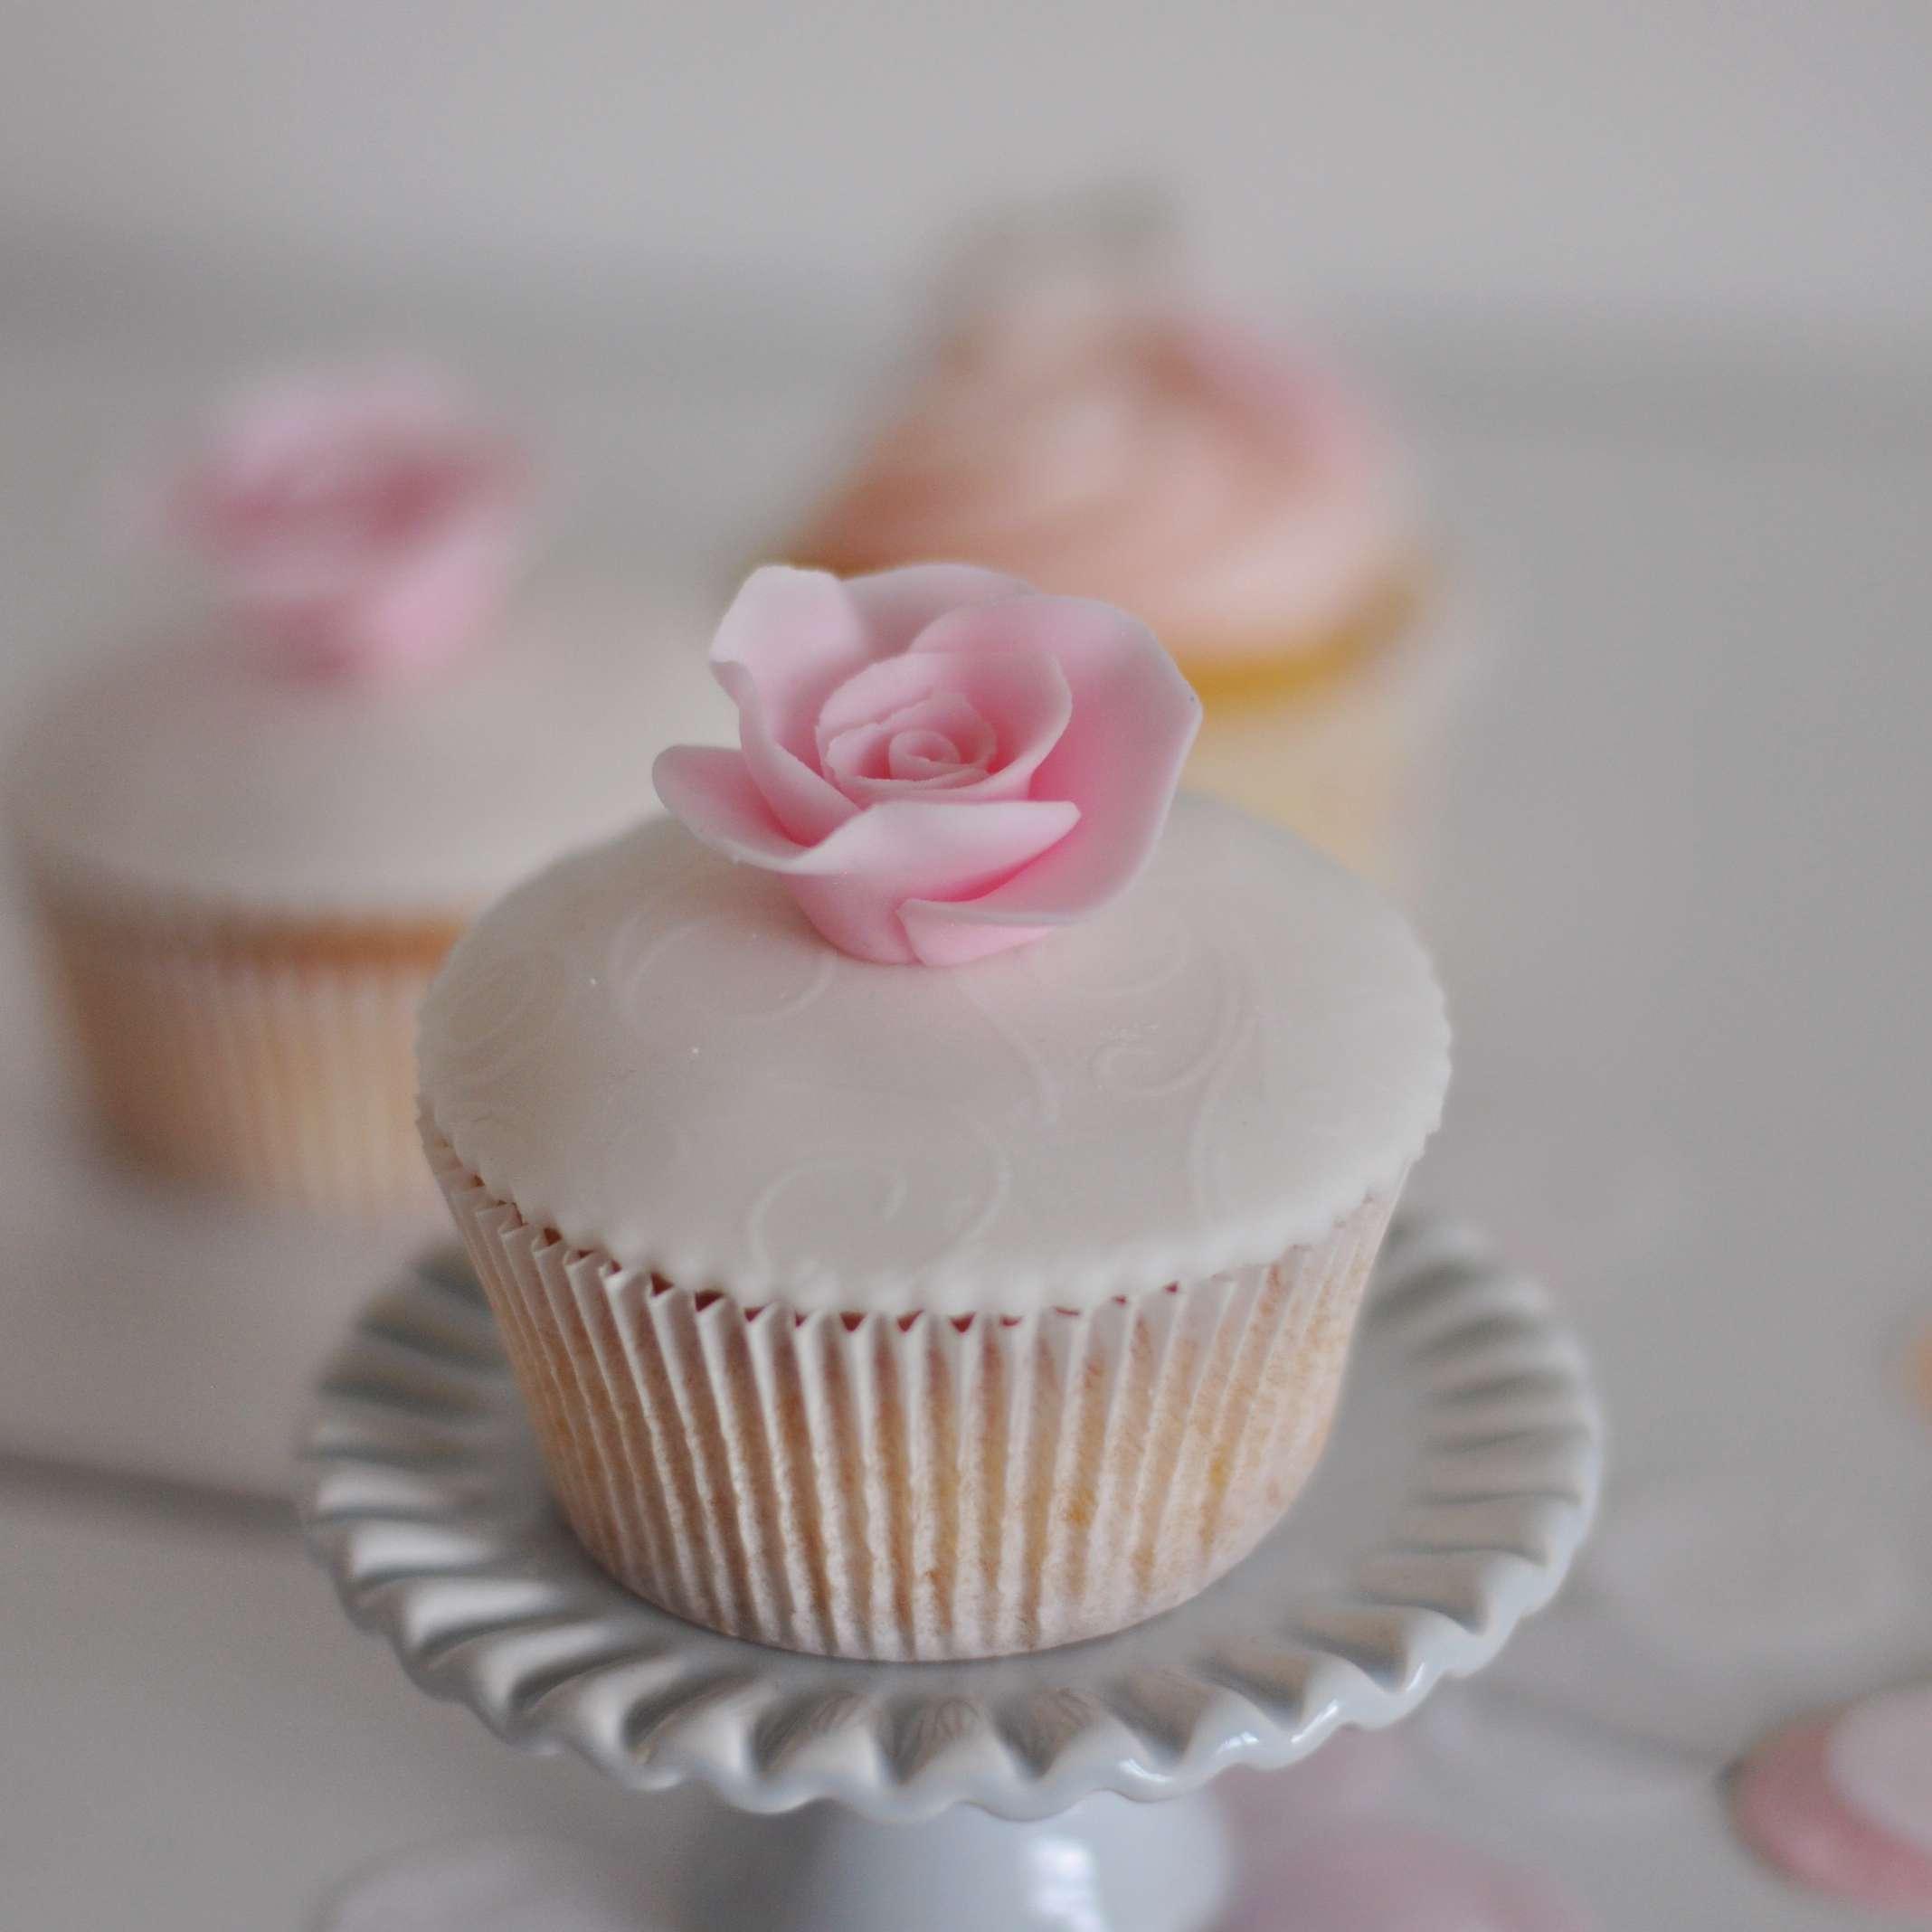 fondant topped cupcake